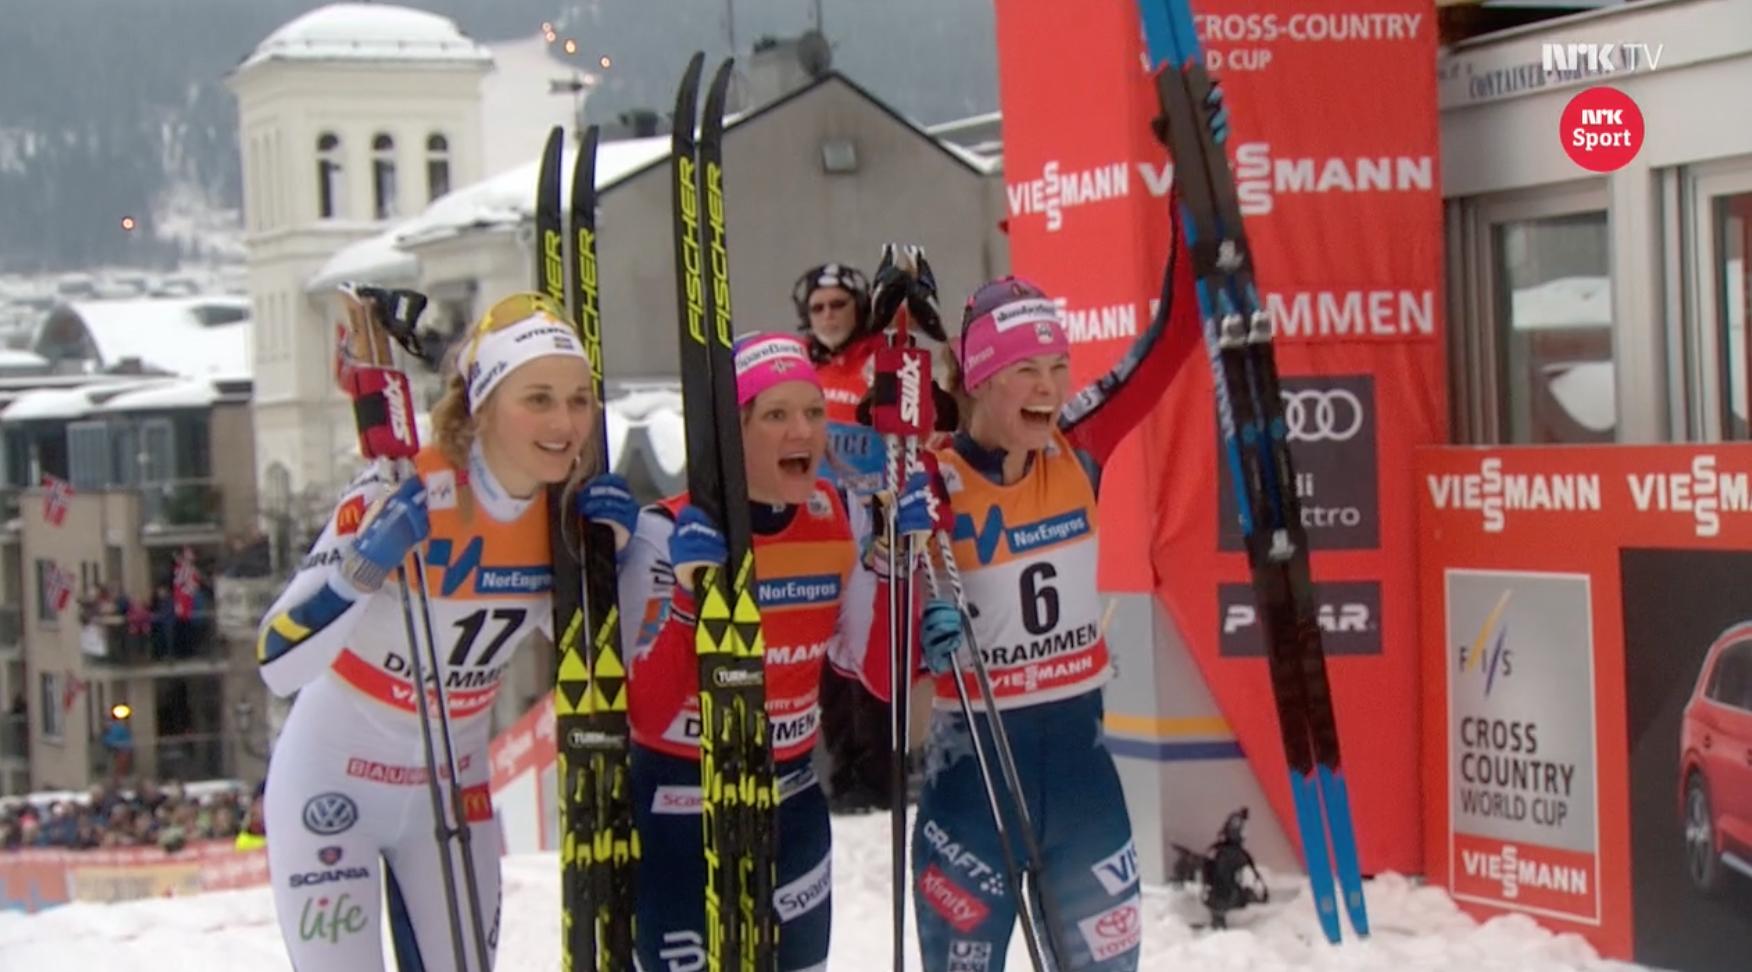 https://fasterskier.com/wp-content/blogs.dir/1/files/2018/03/Drammen-womens-podium.png